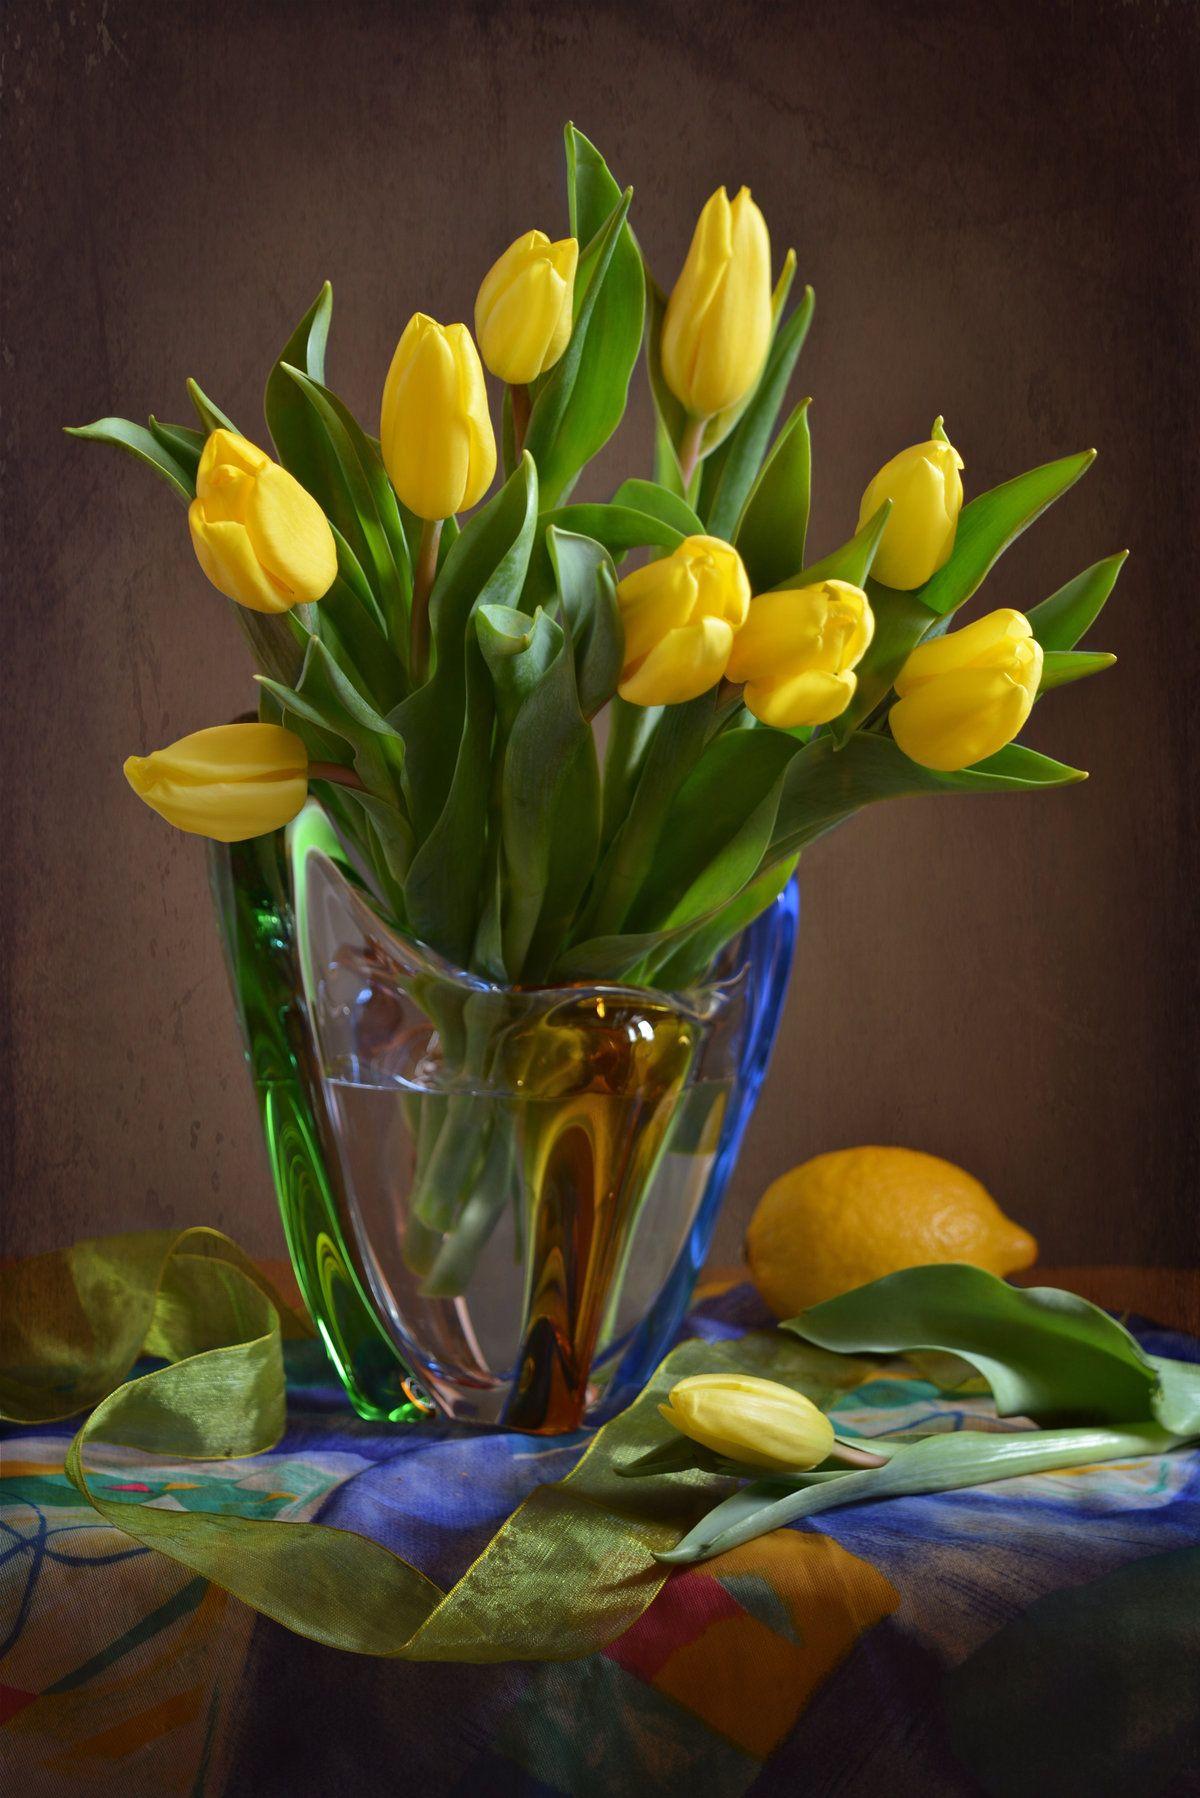 Открытка с желтыми тюльпанами